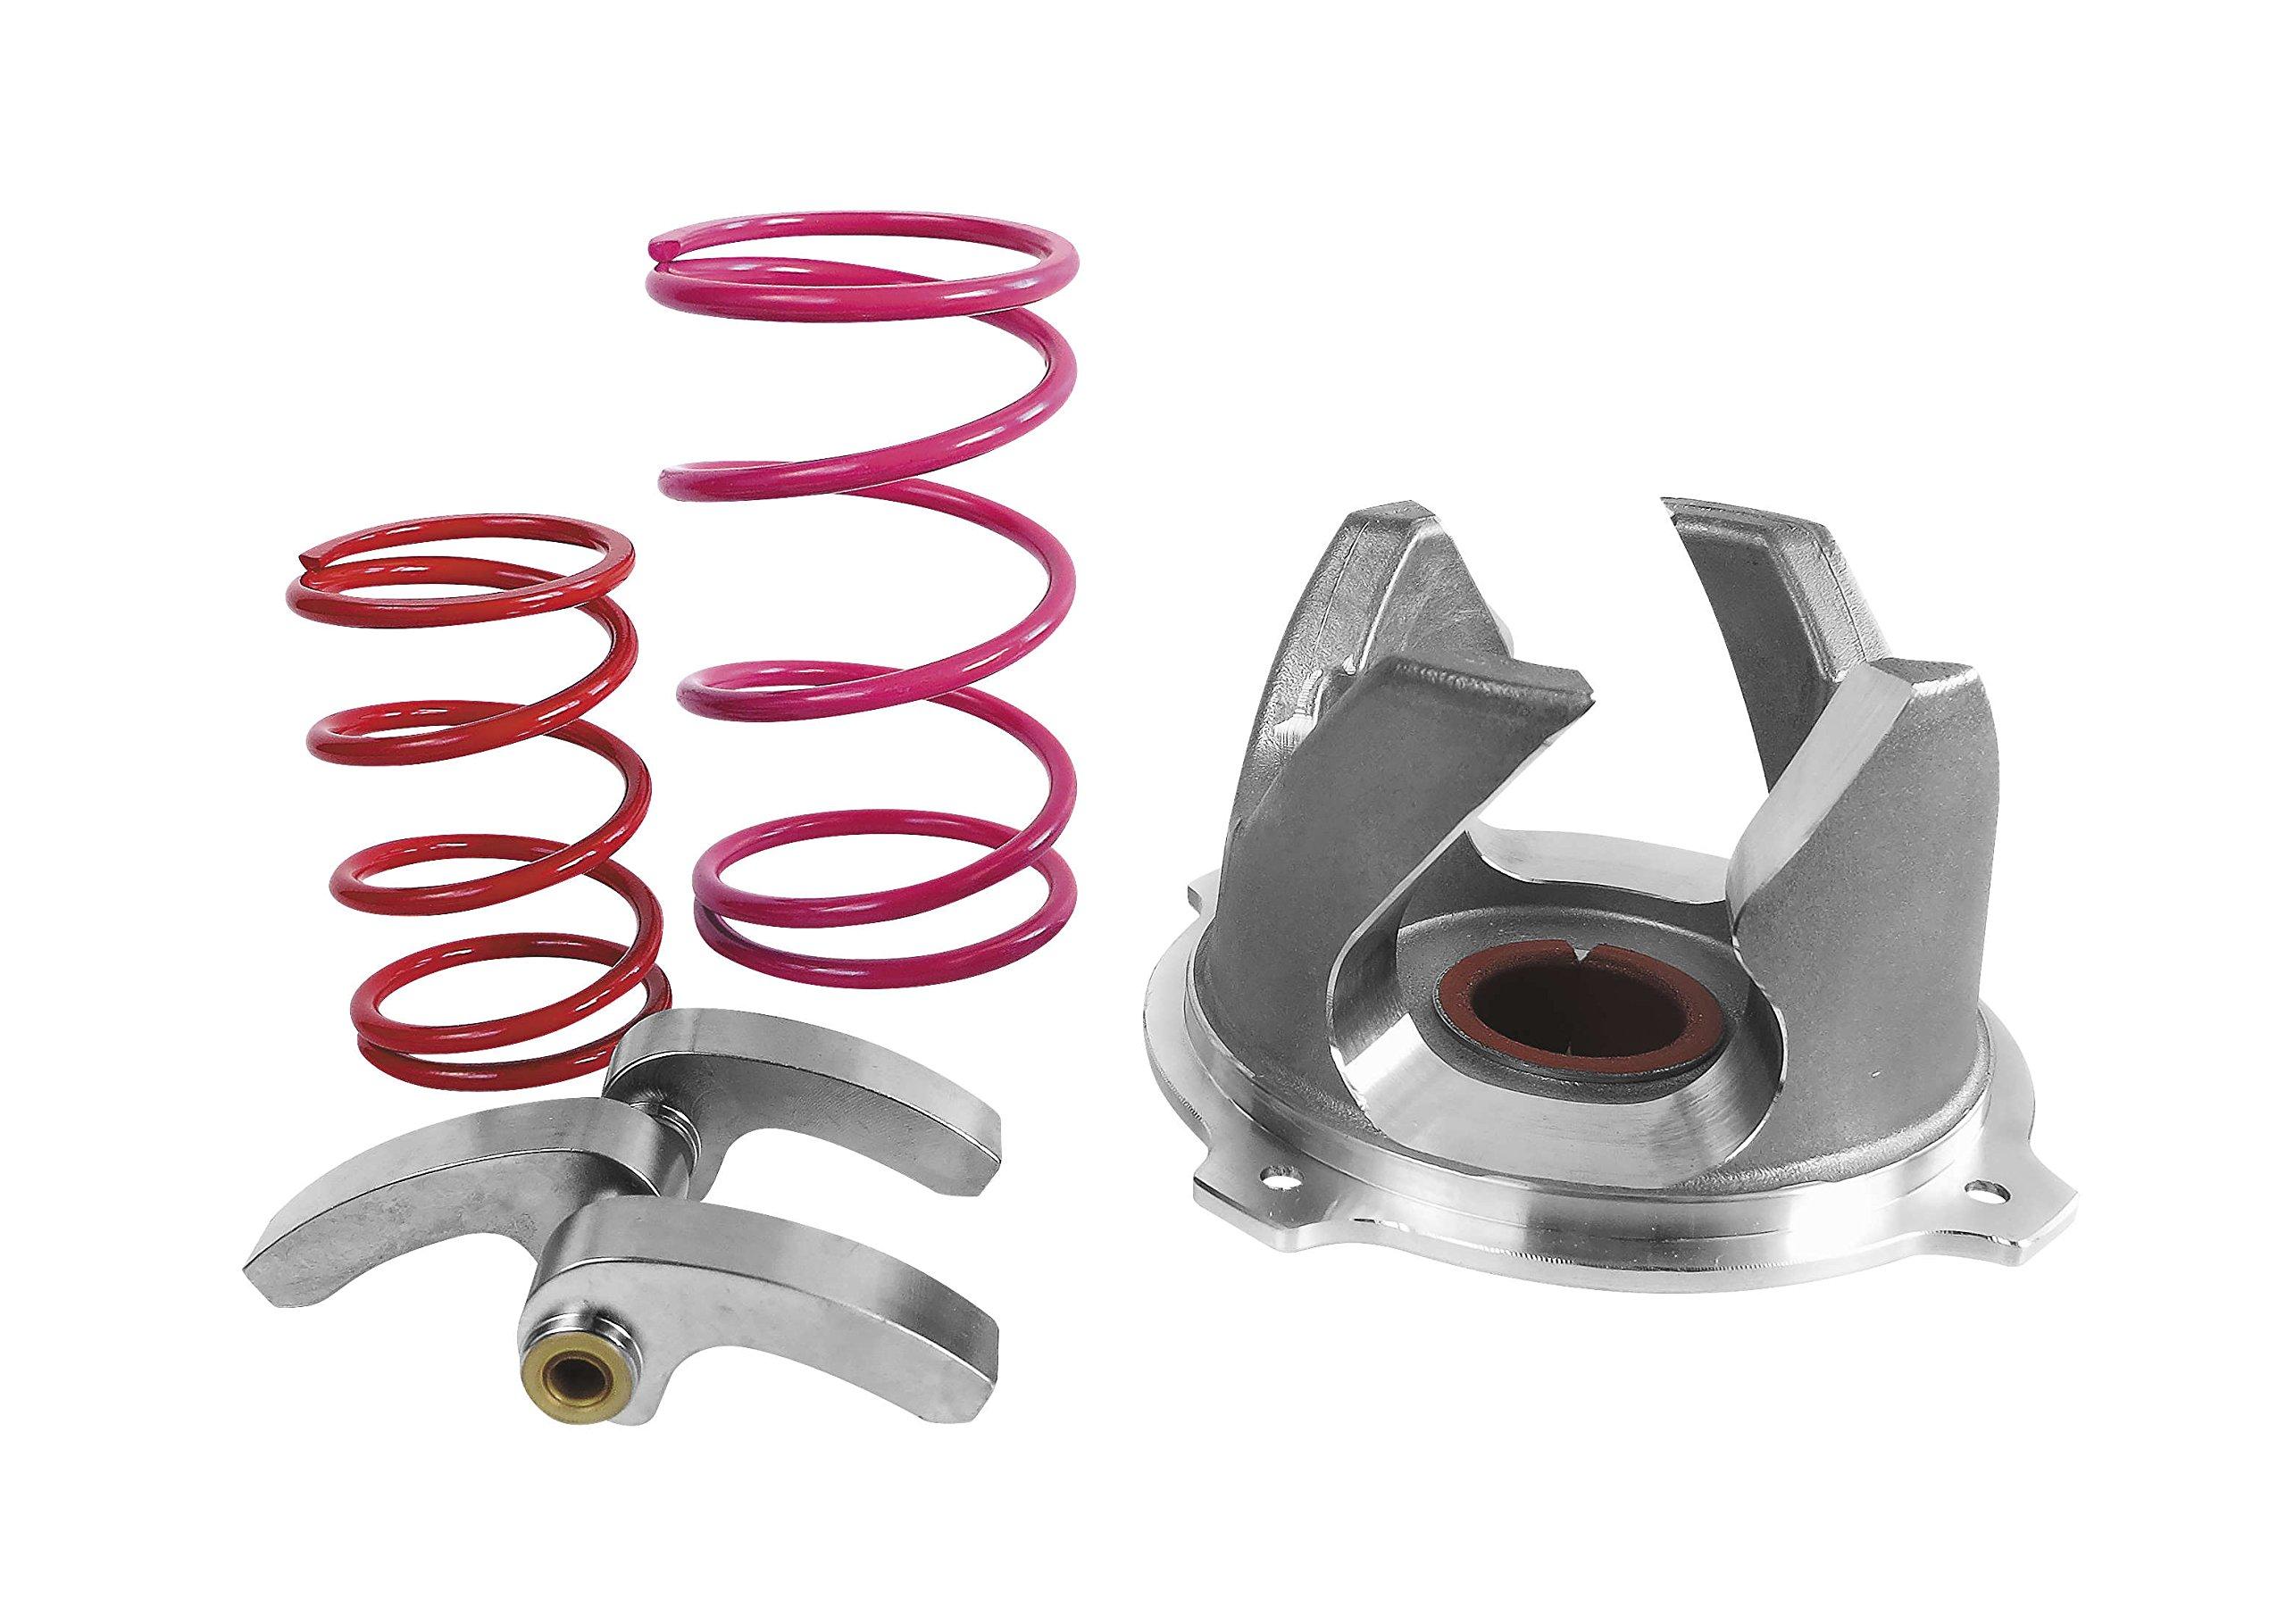 EPI XF-1-982817 Sport Utility Clutch Kit - Elevation: 0-3000ft. - Stock Tires